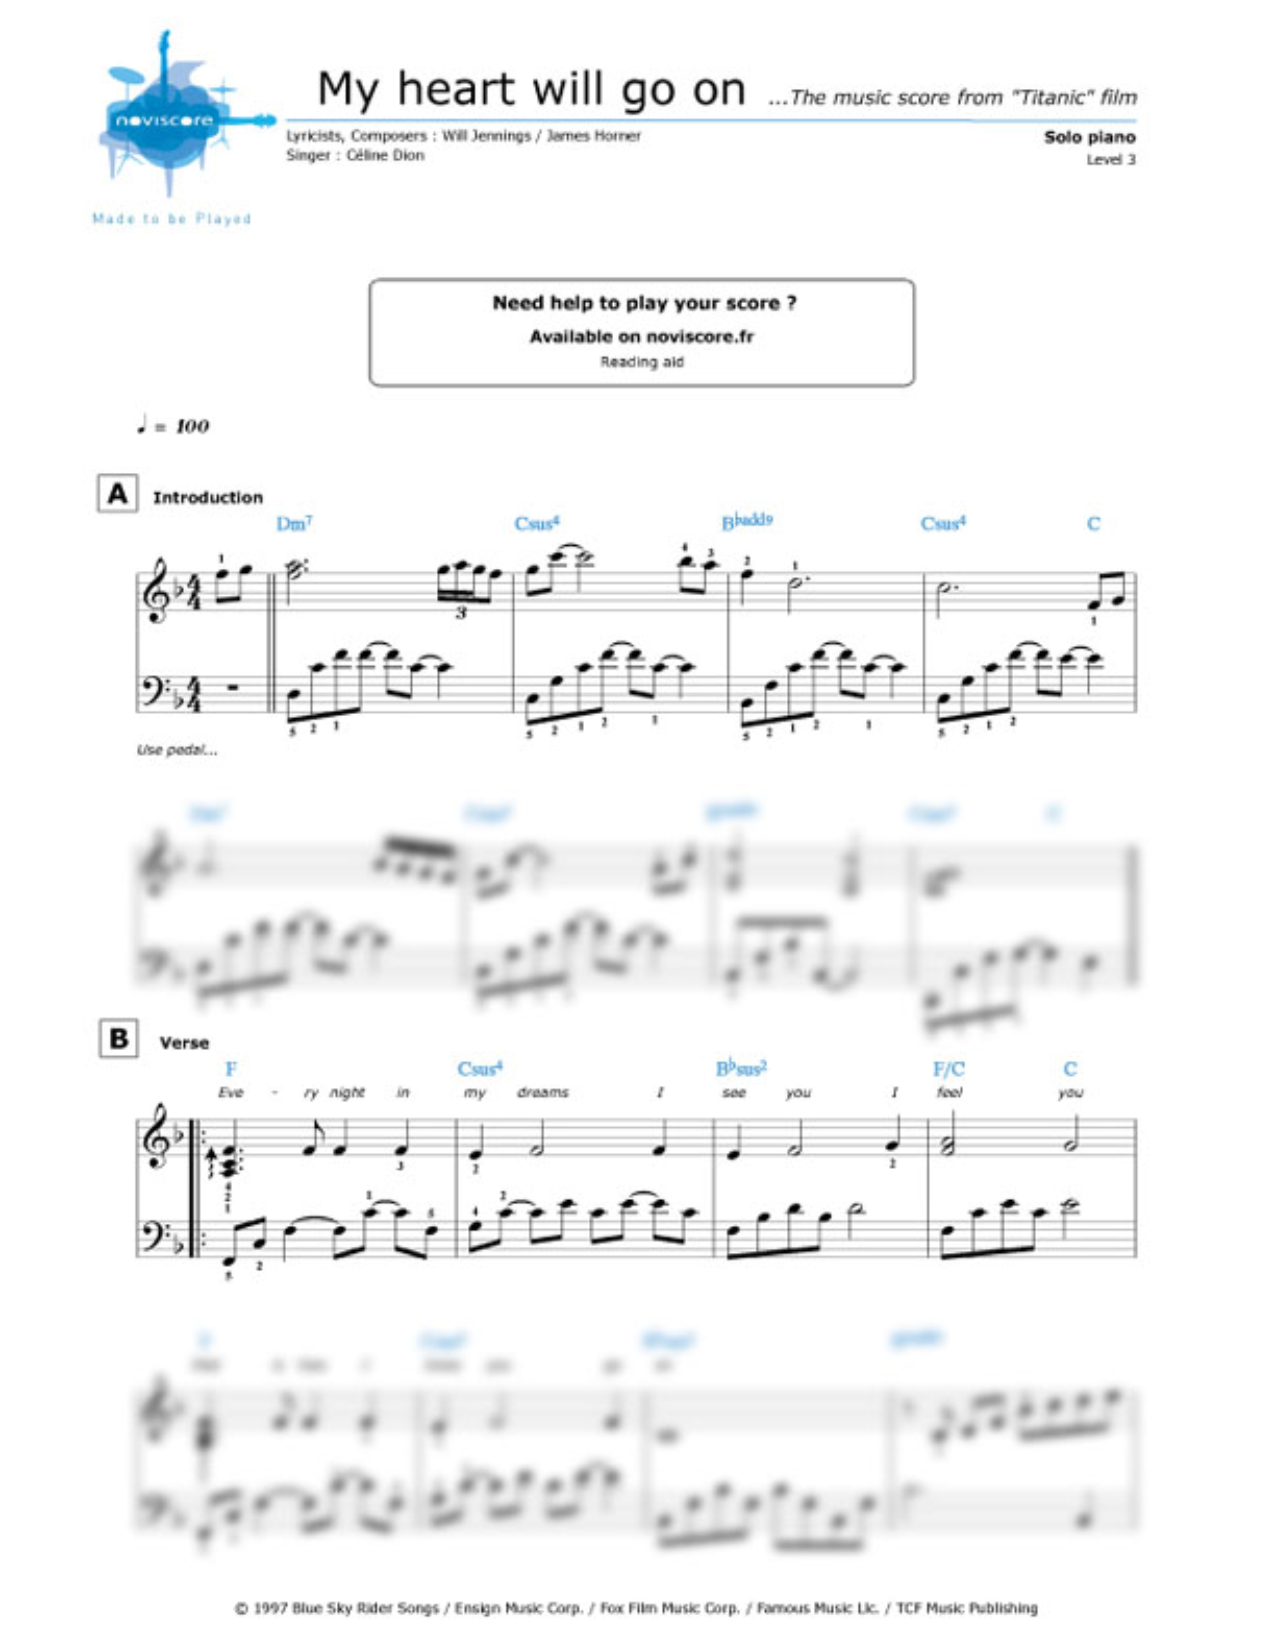 All Music Chords my heart will go on sheet music : Piano sheet music My Heart Will Go On (Céline Dion) | Noviscore sheets